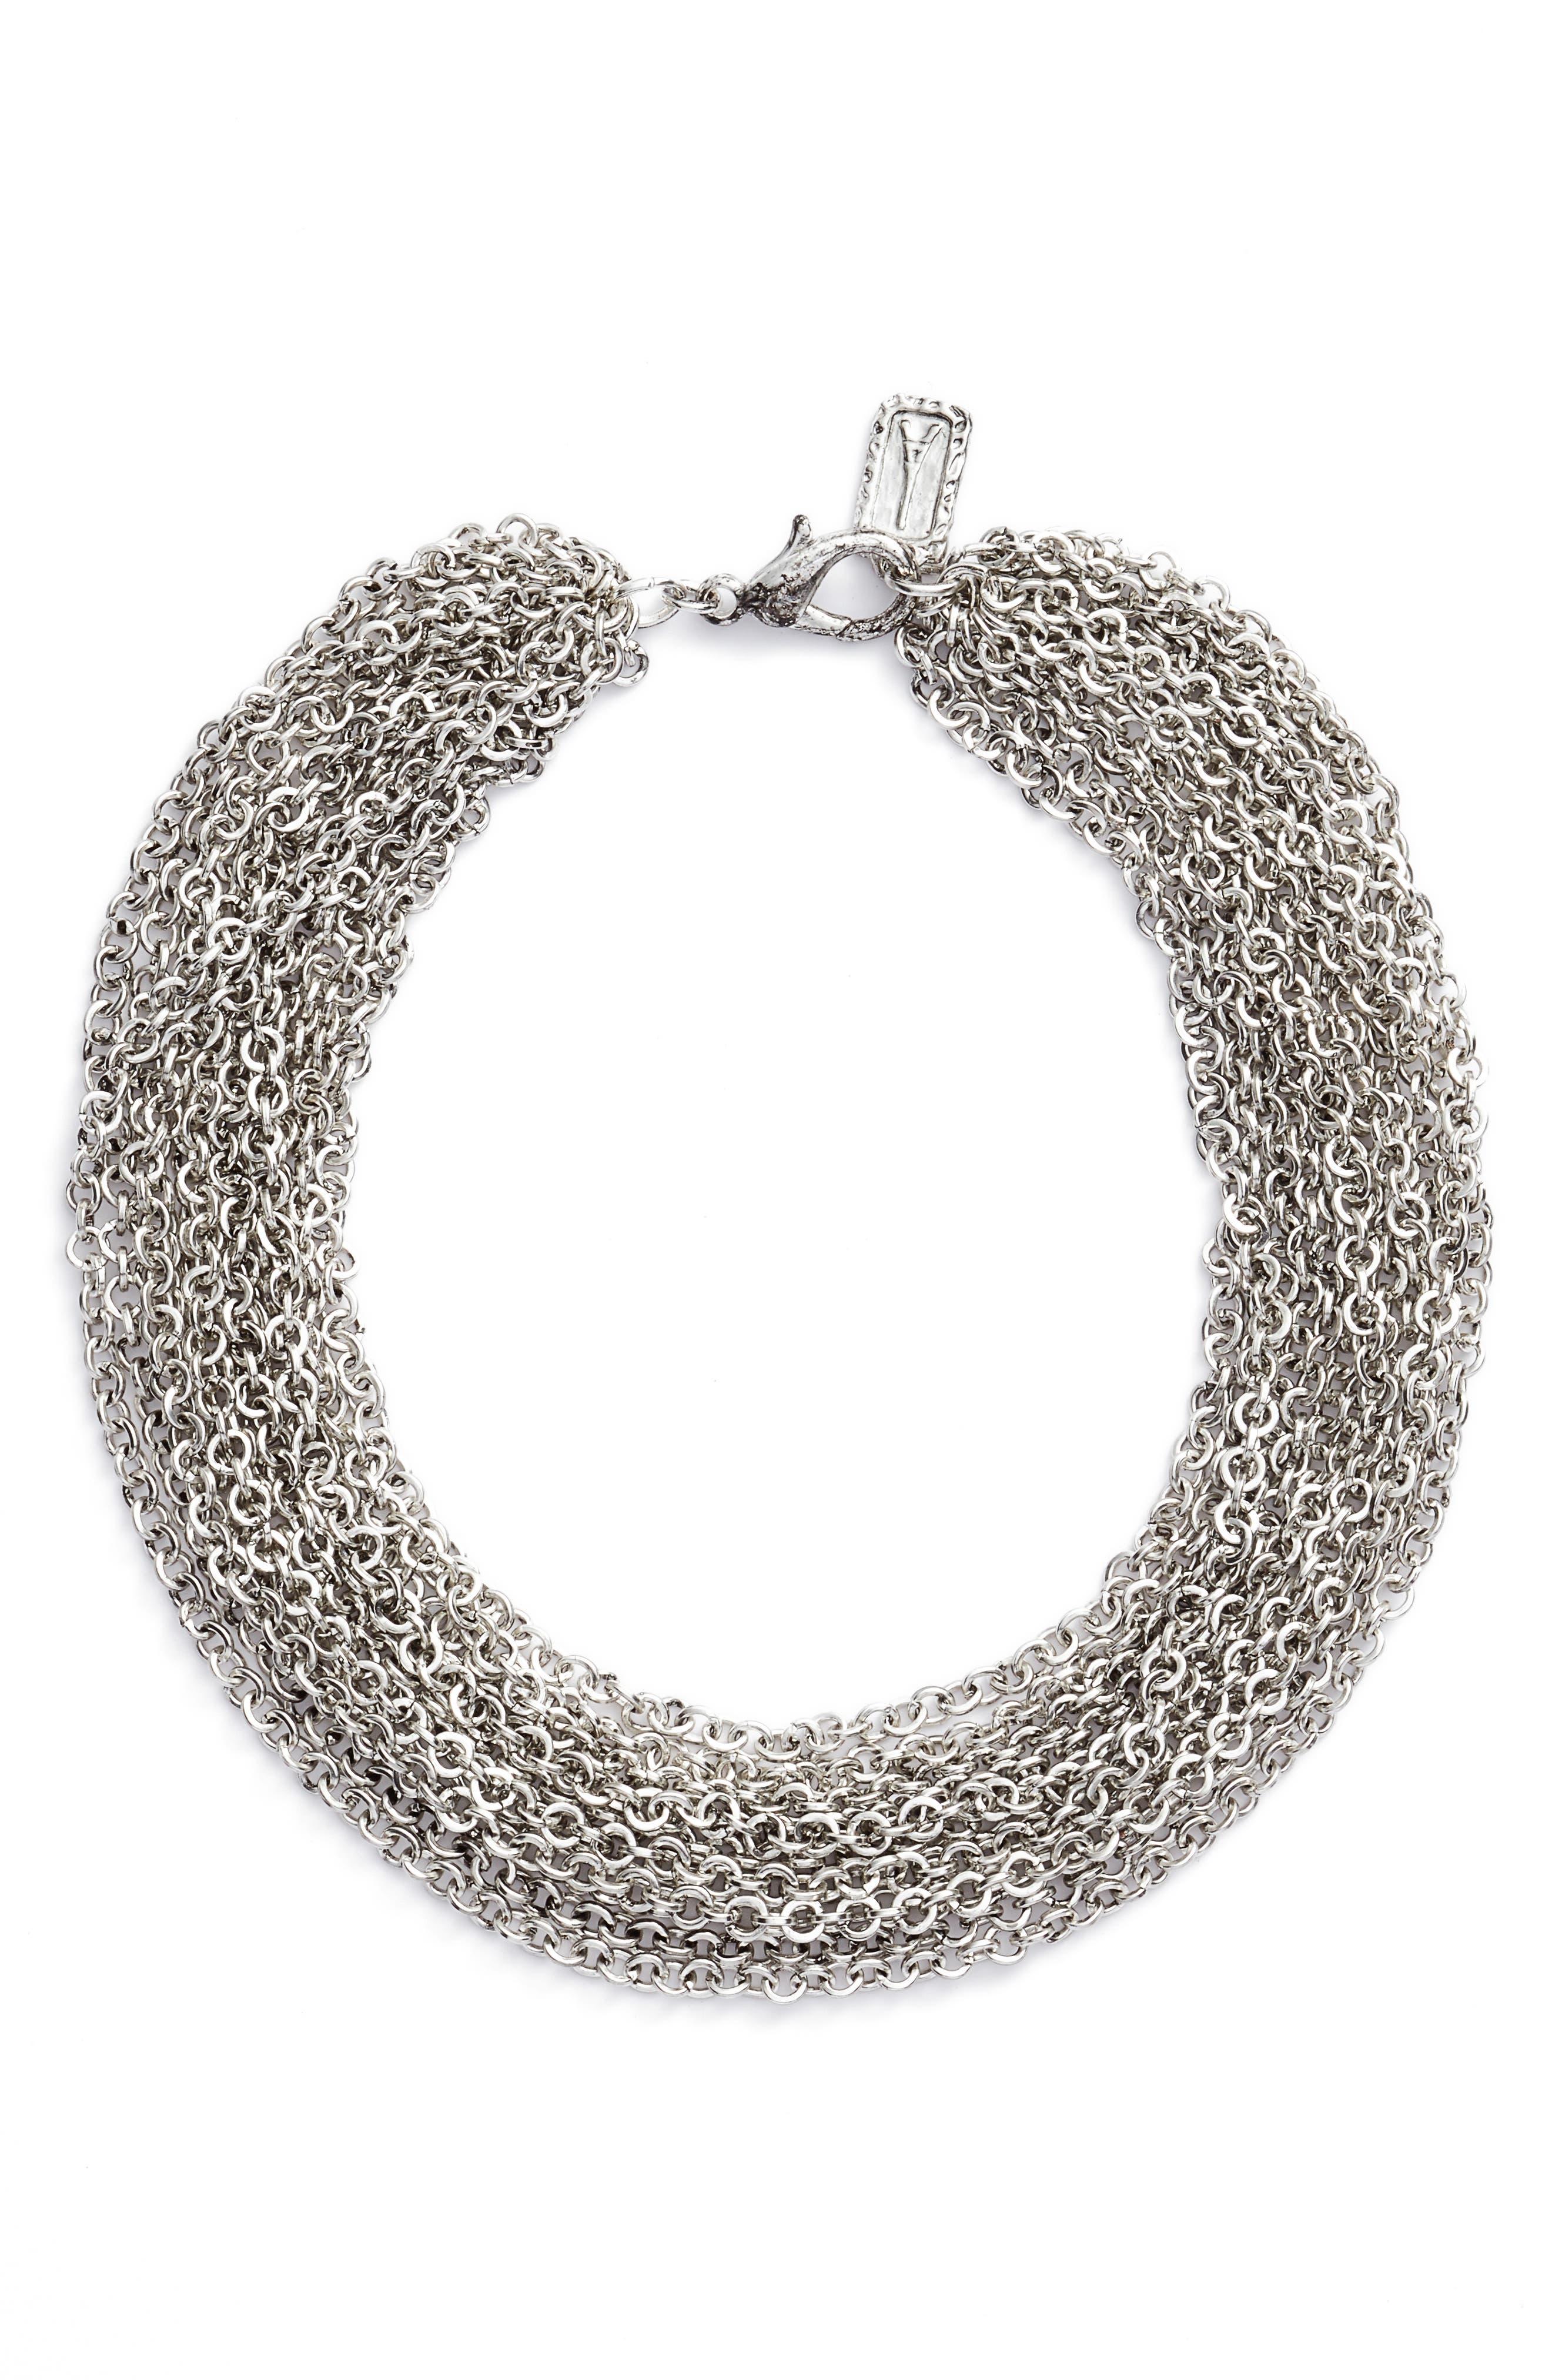 Adeline Collar Necklace,                         Main,                         color, SILVER